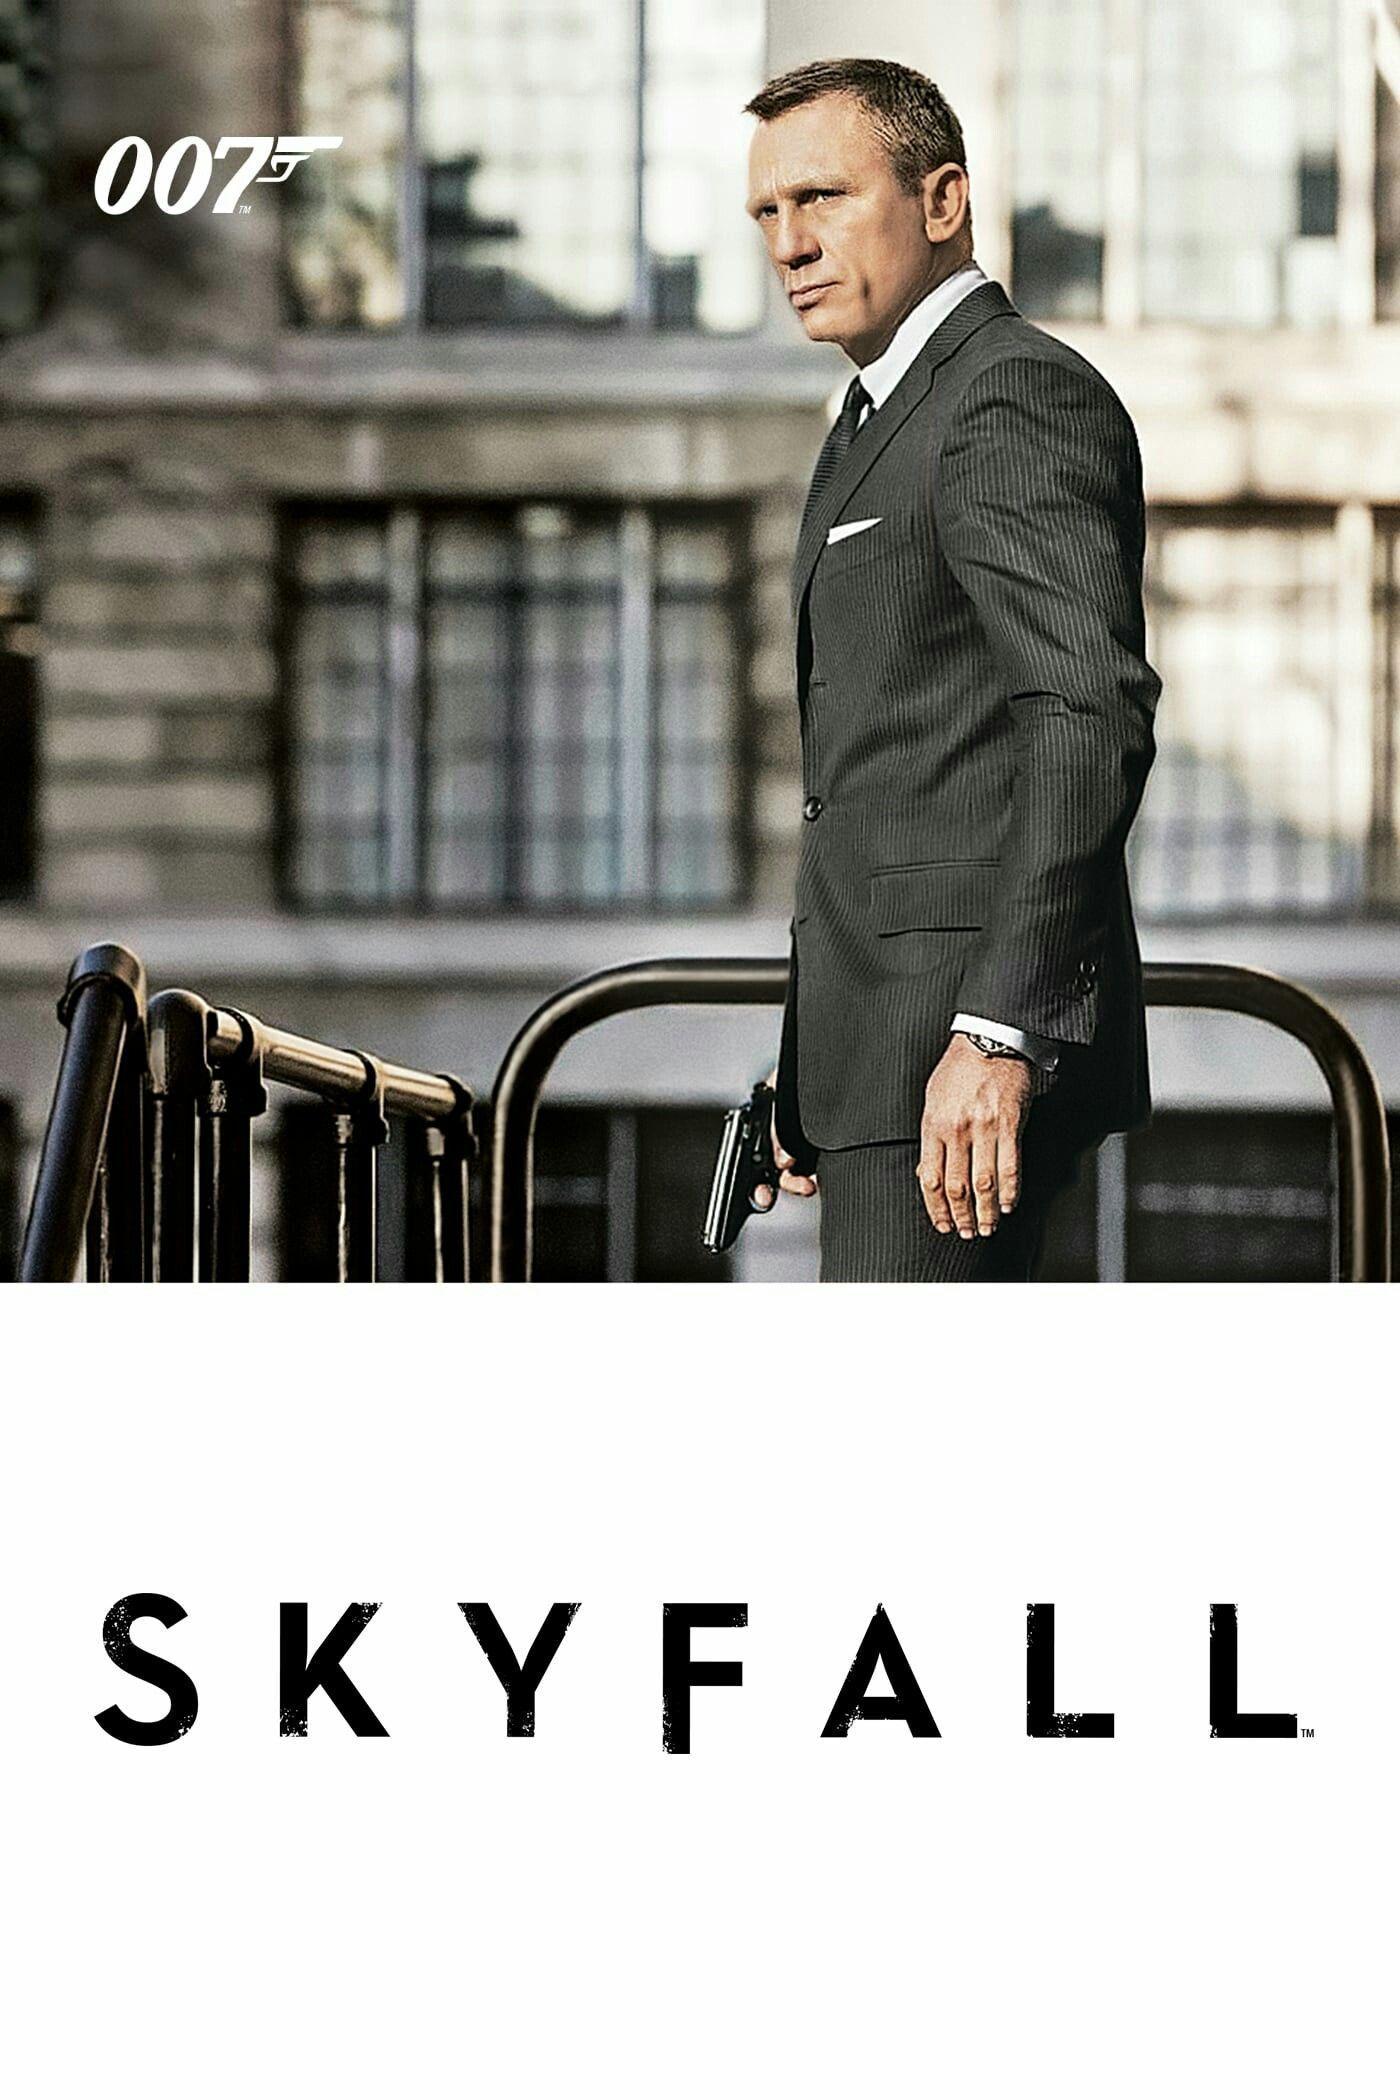 75afcaaec1a James Bond 007 Movie Posters and Artwork  007  jamesbond ...